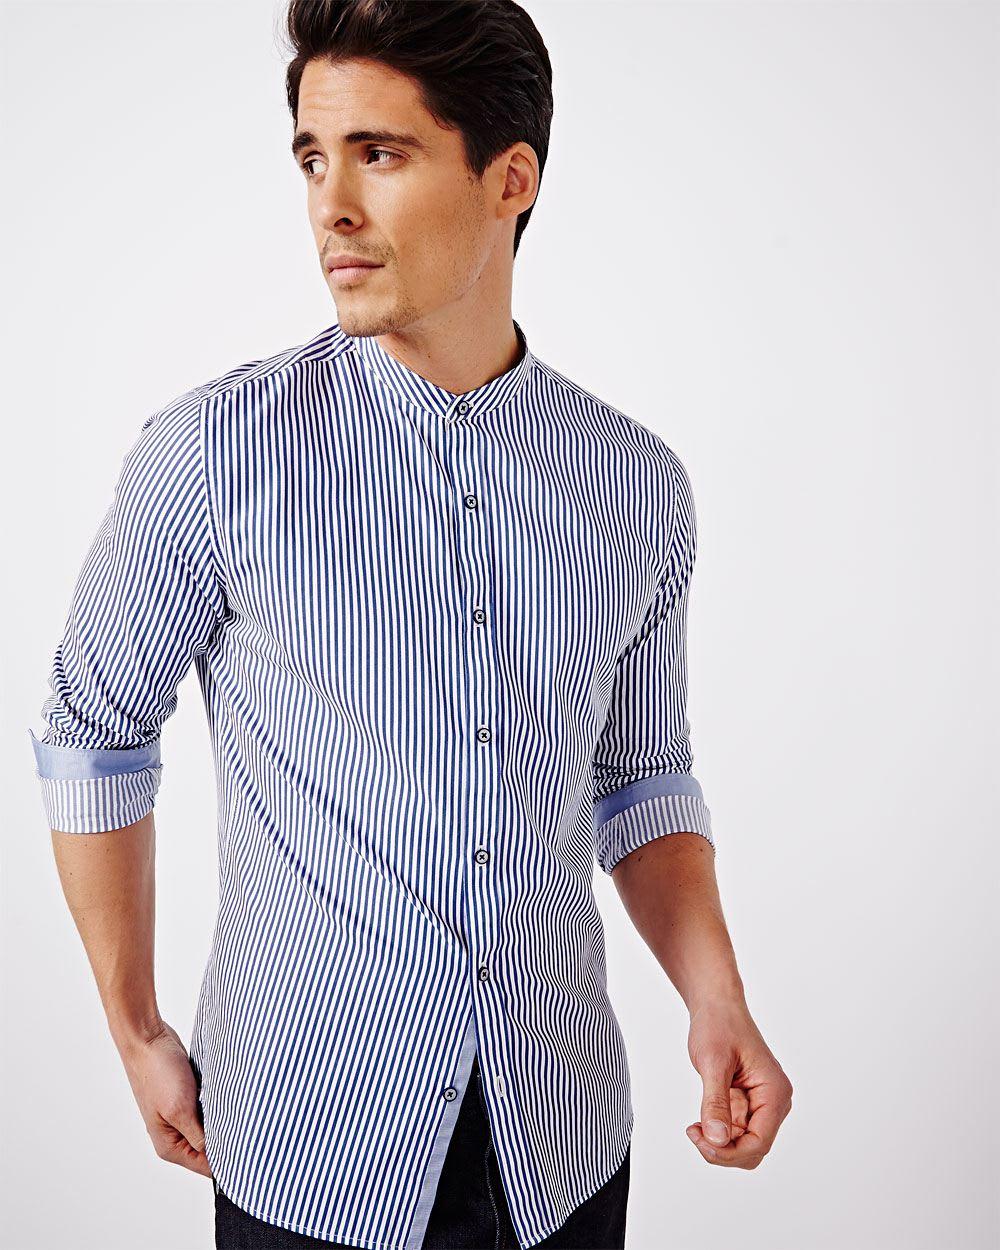 b48c68aa3 Tailored Fit Striped Shirt with Mandarin Collar | RW&CO.